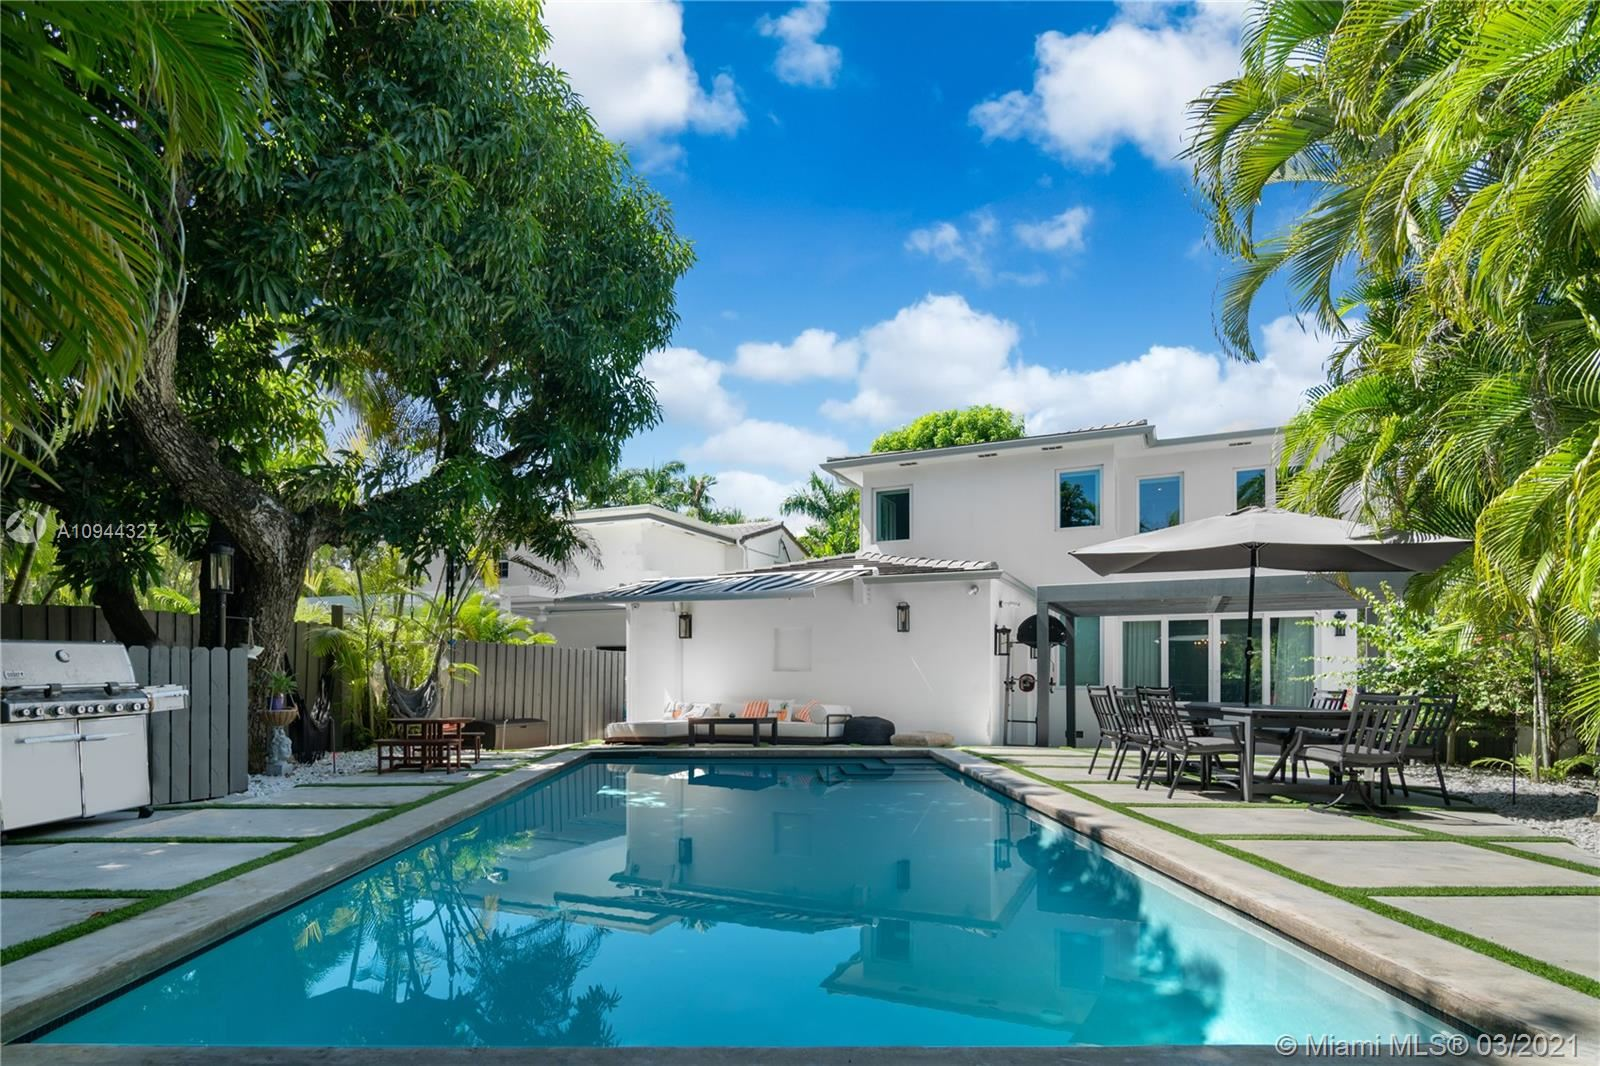 4361 Royal Palm Ave, Miami Beach, FL 33140 - #: A10944327